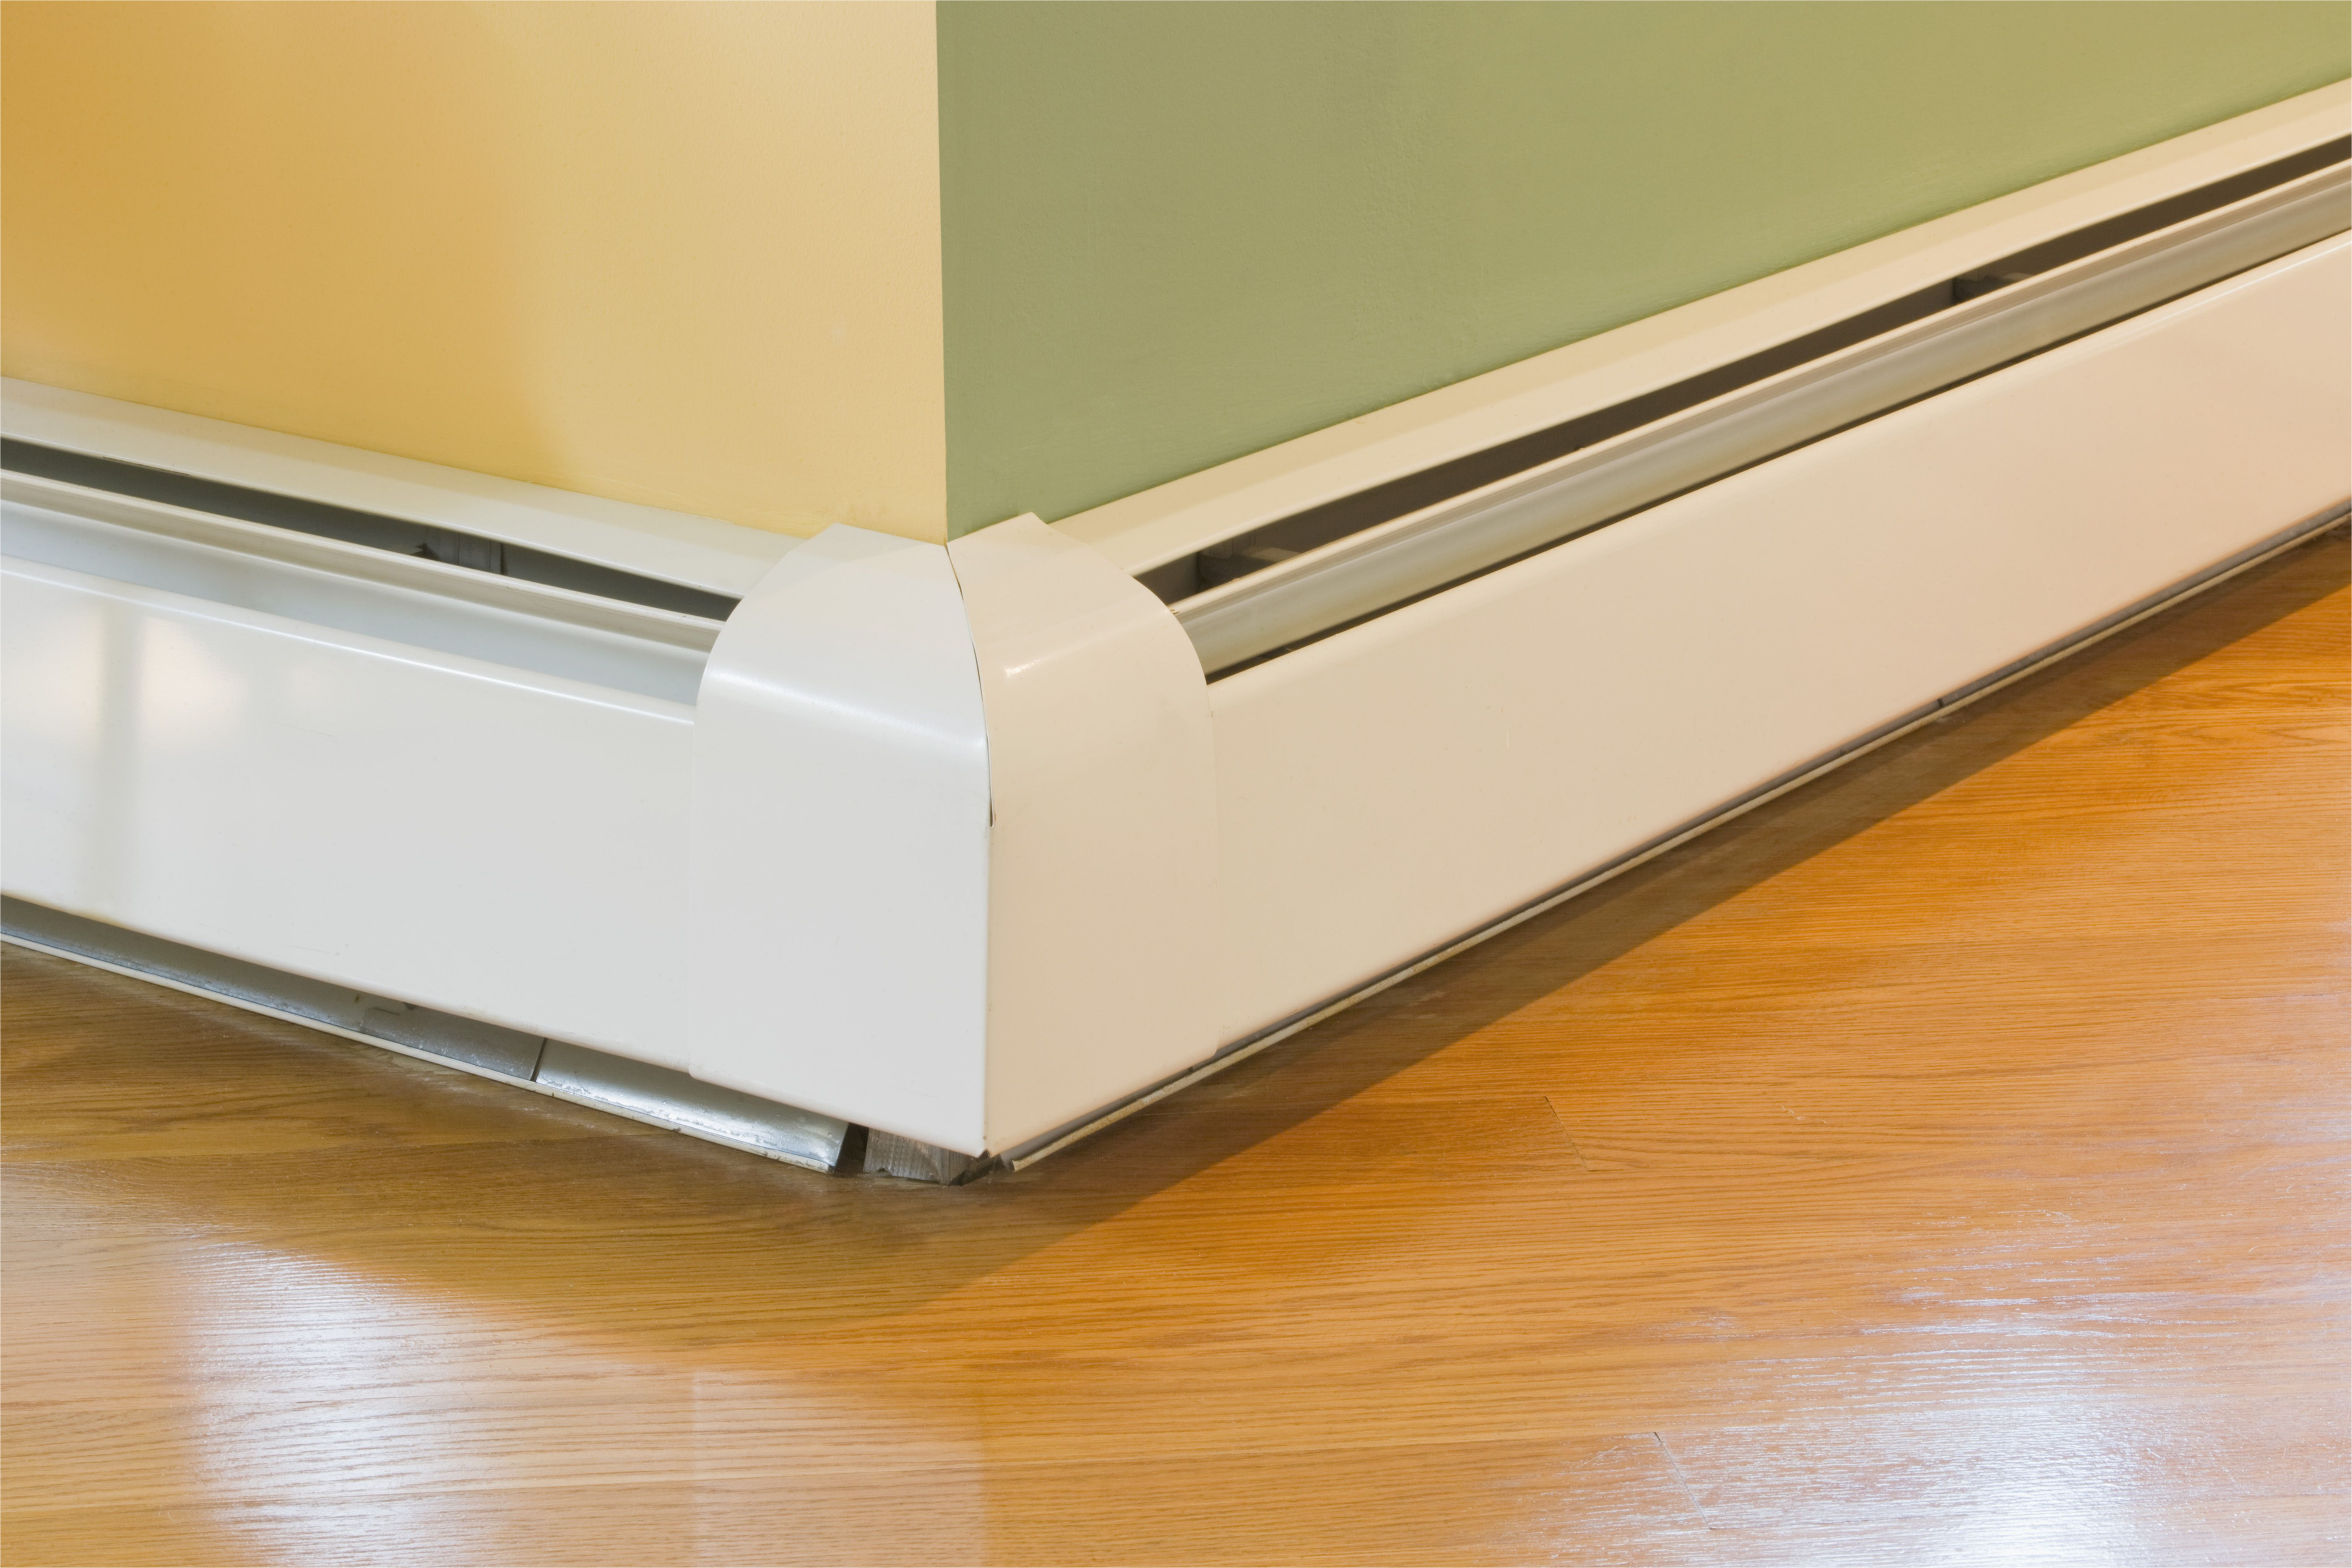 baseboard heater 80509465 5845a80c3df78c0230f3090c jpg